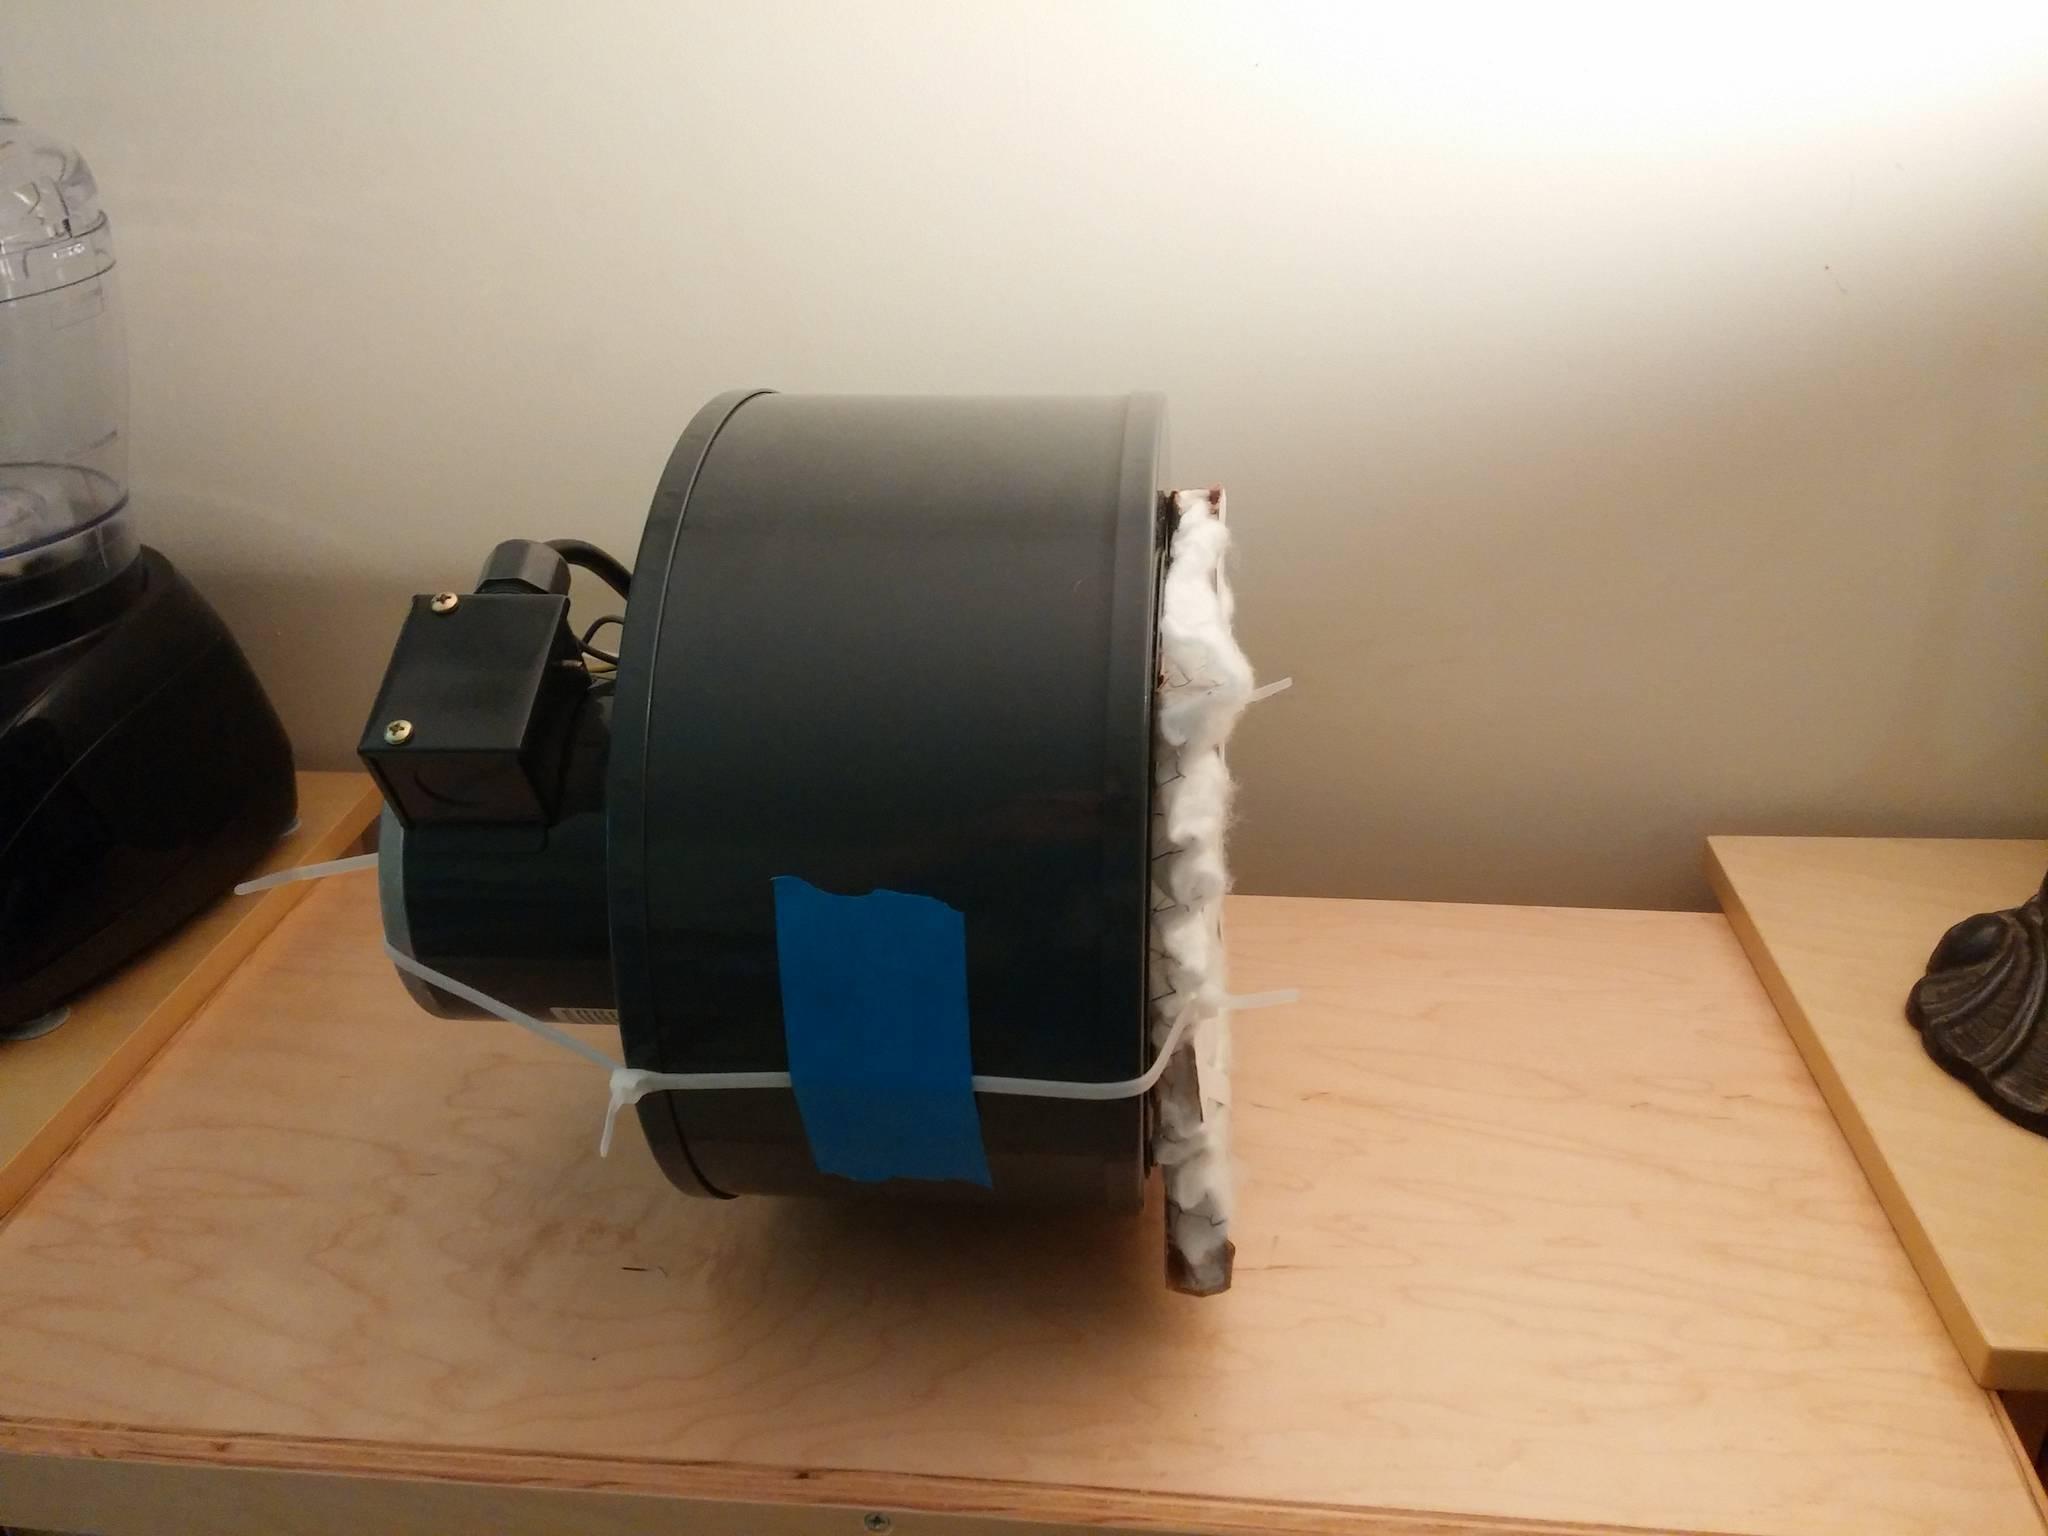 how to make a laminar flow hood